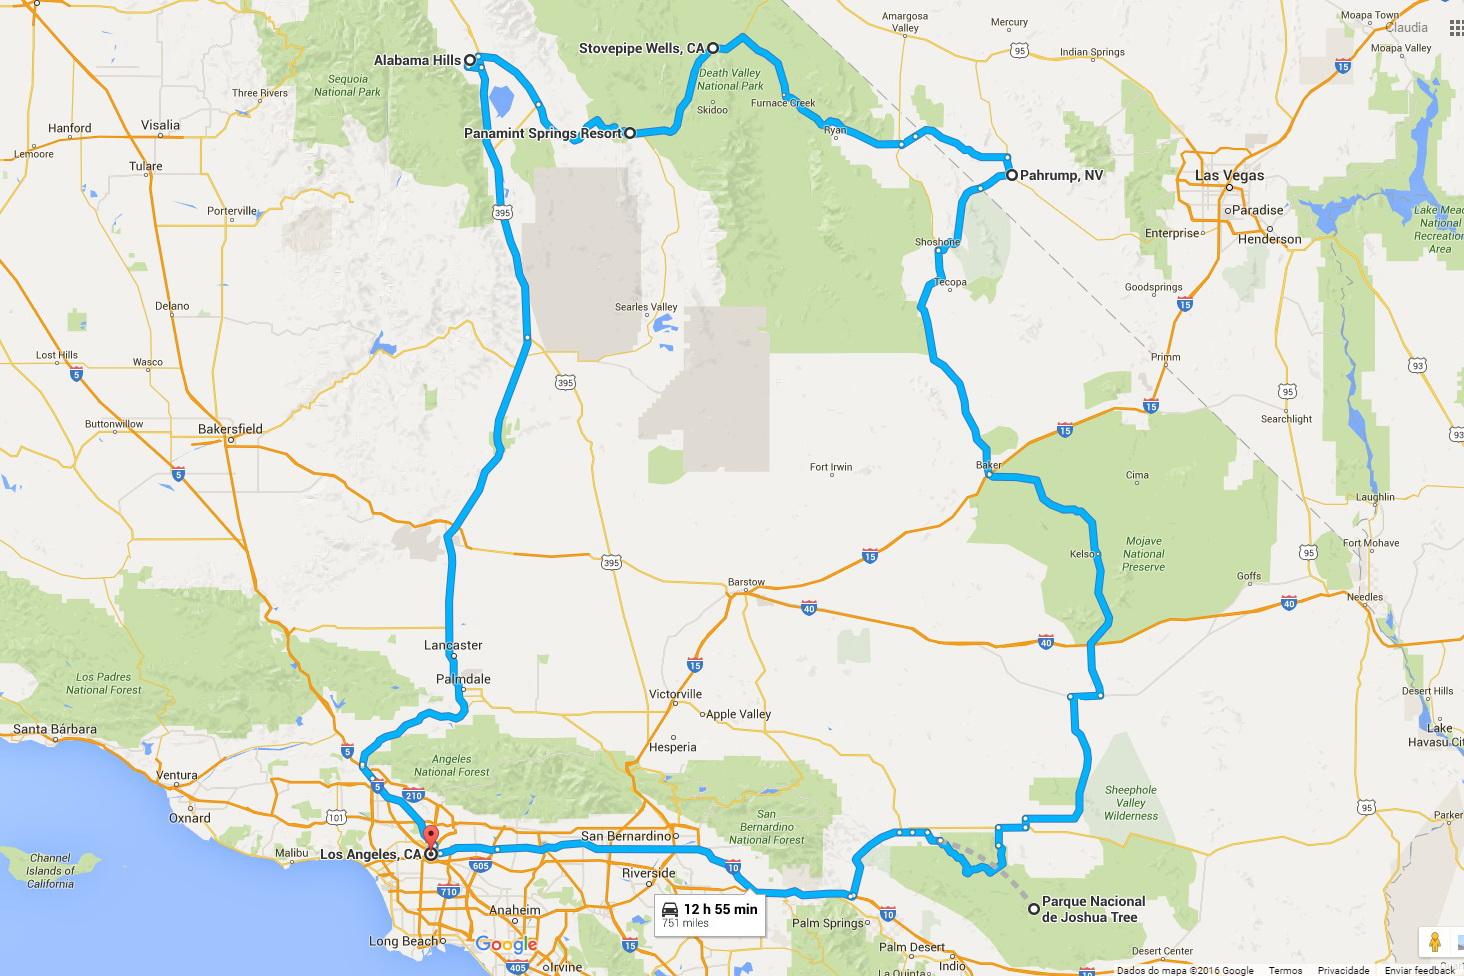 Mapa-California-2016